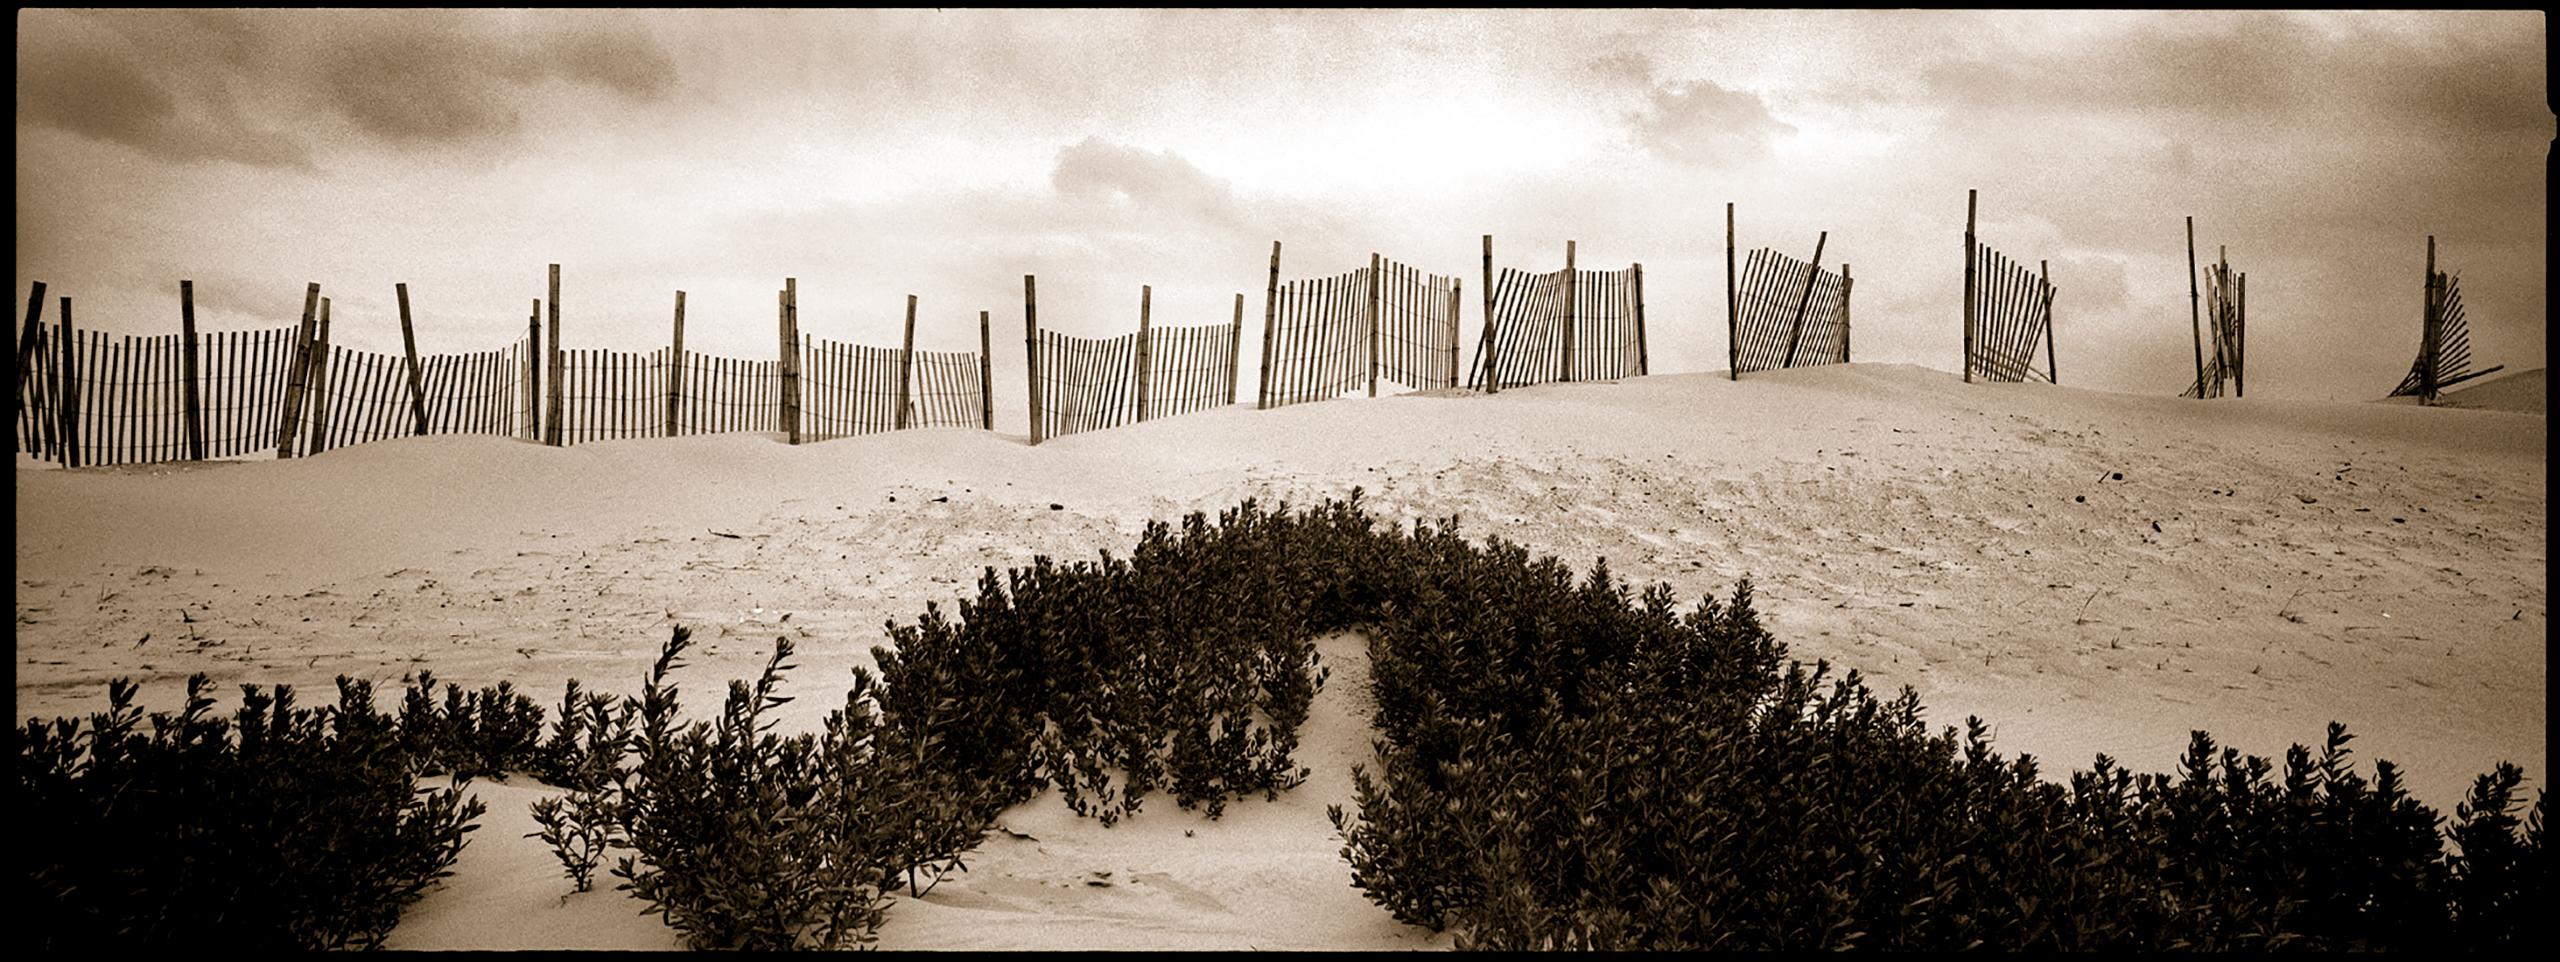 Broken-Fence-Duotone.srgb.jpg